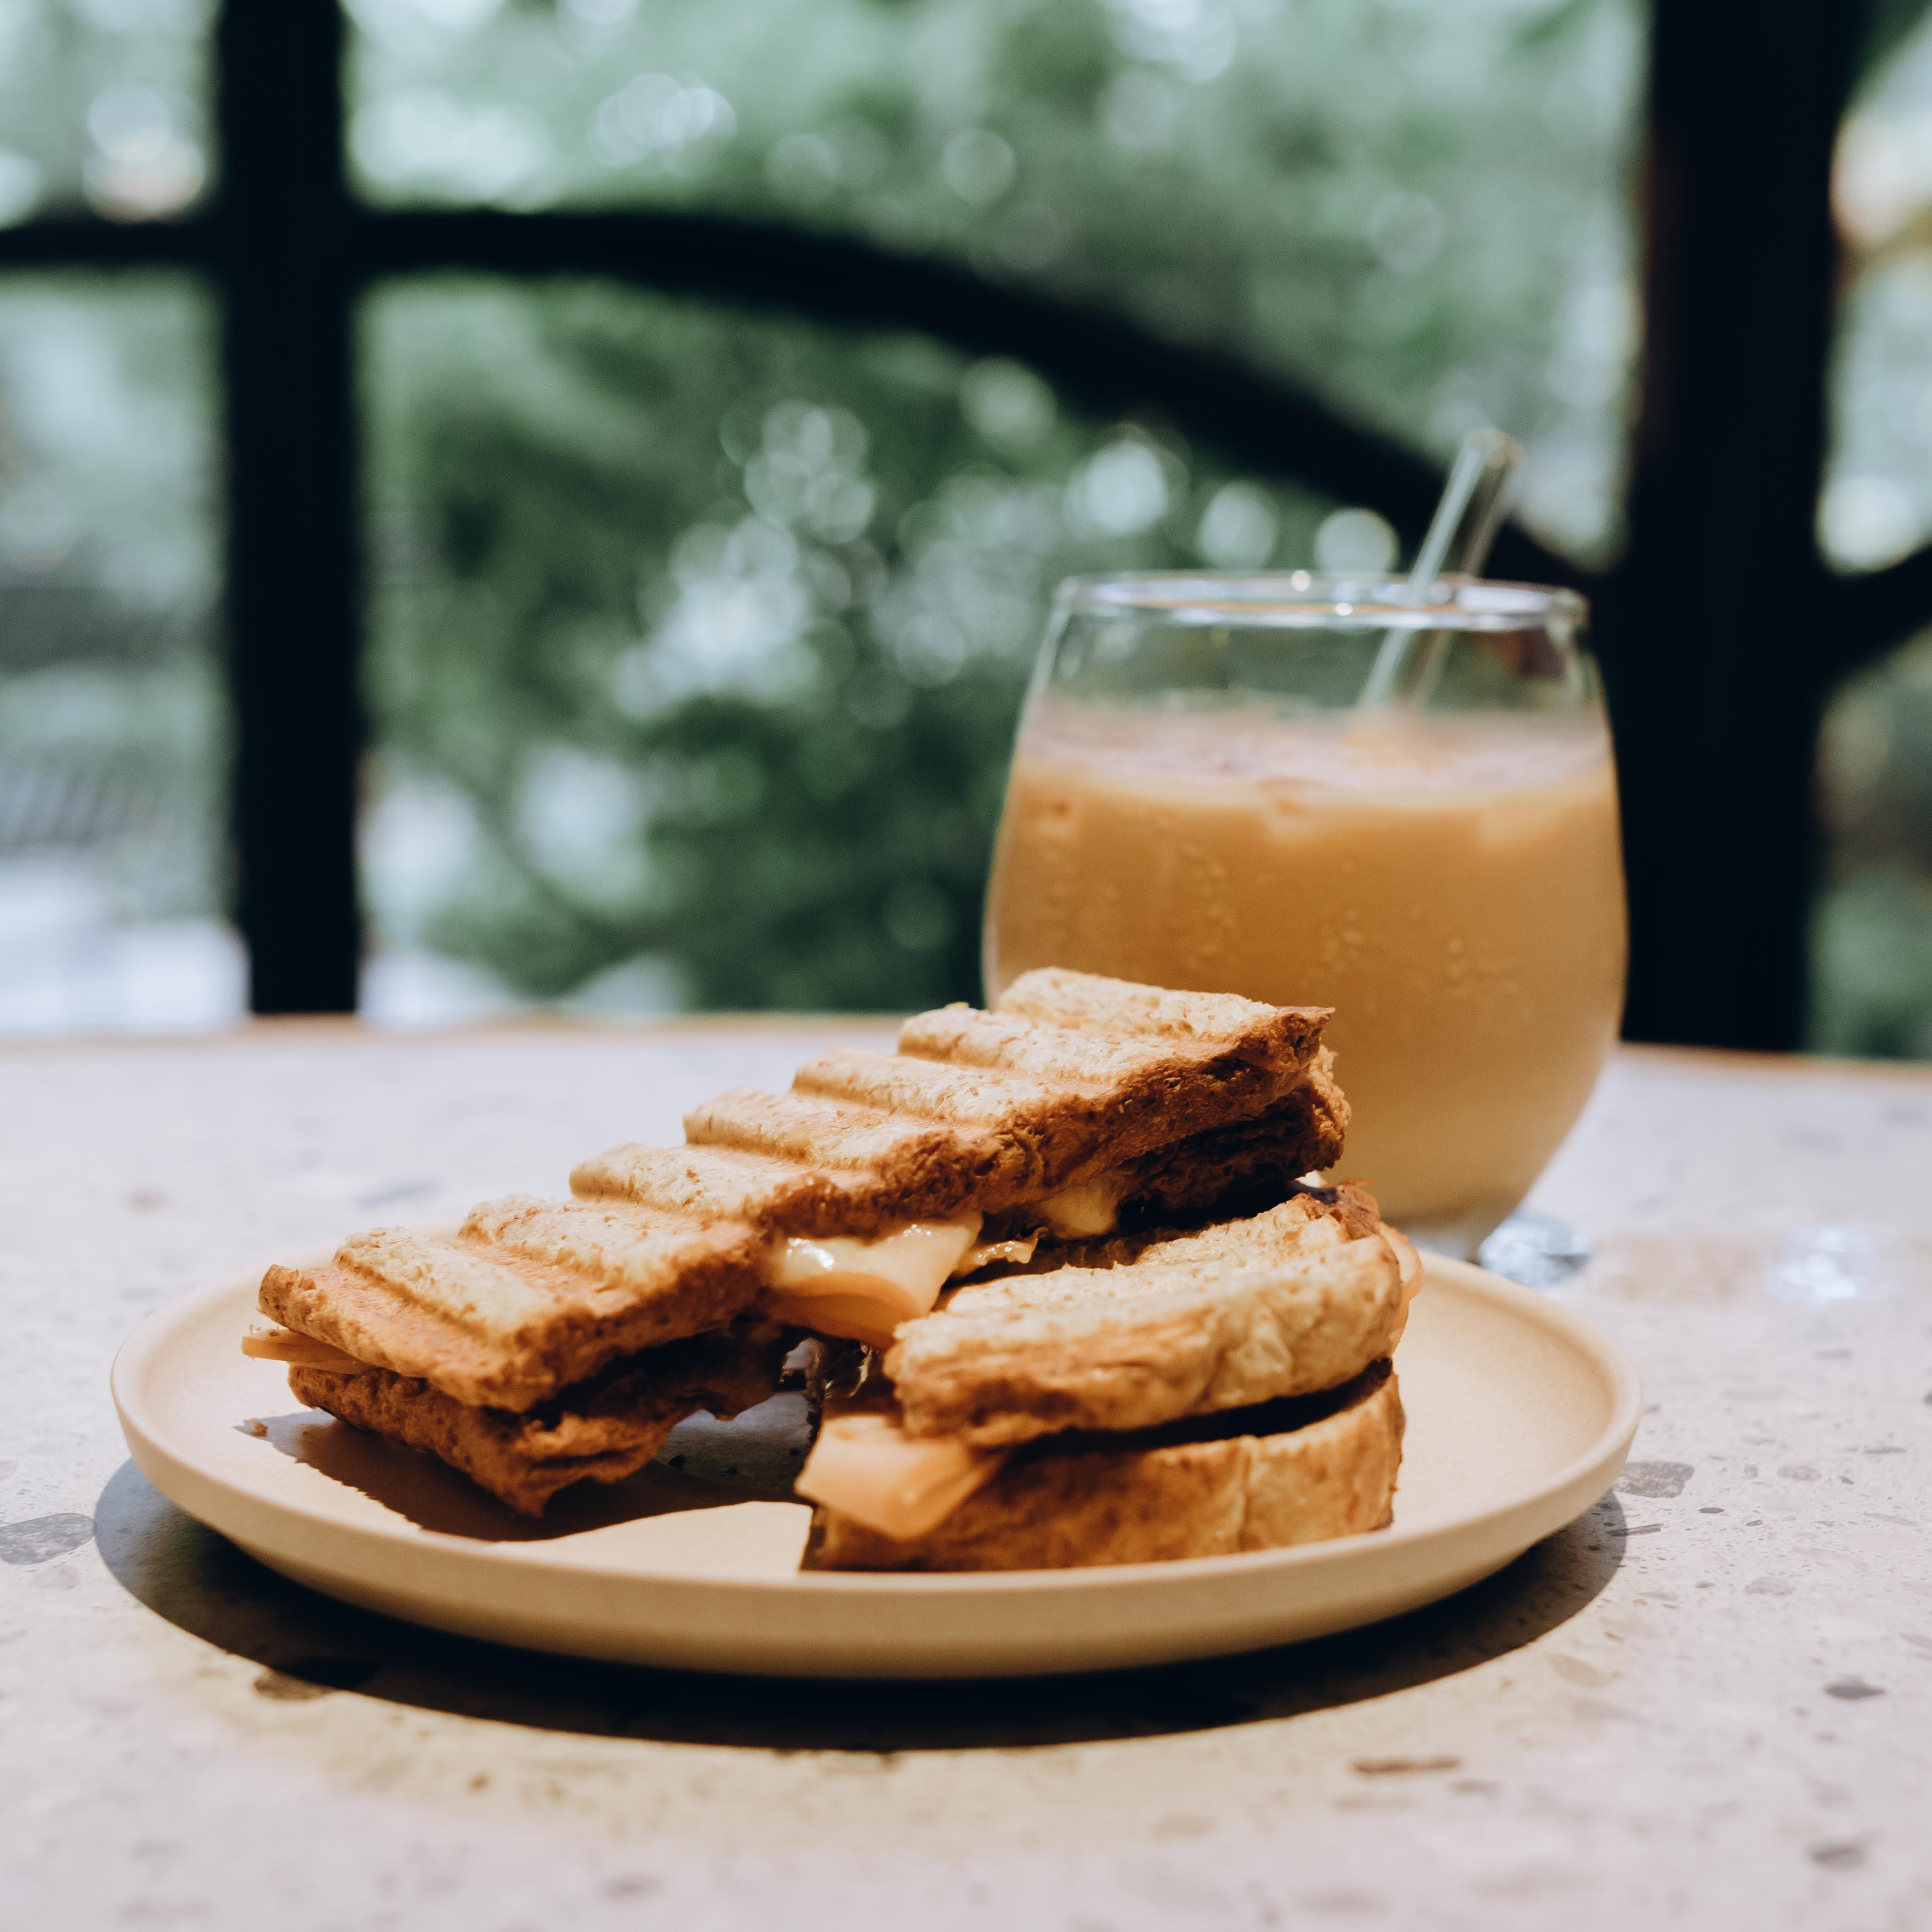 1 x Grilled Sandwich + Coffee